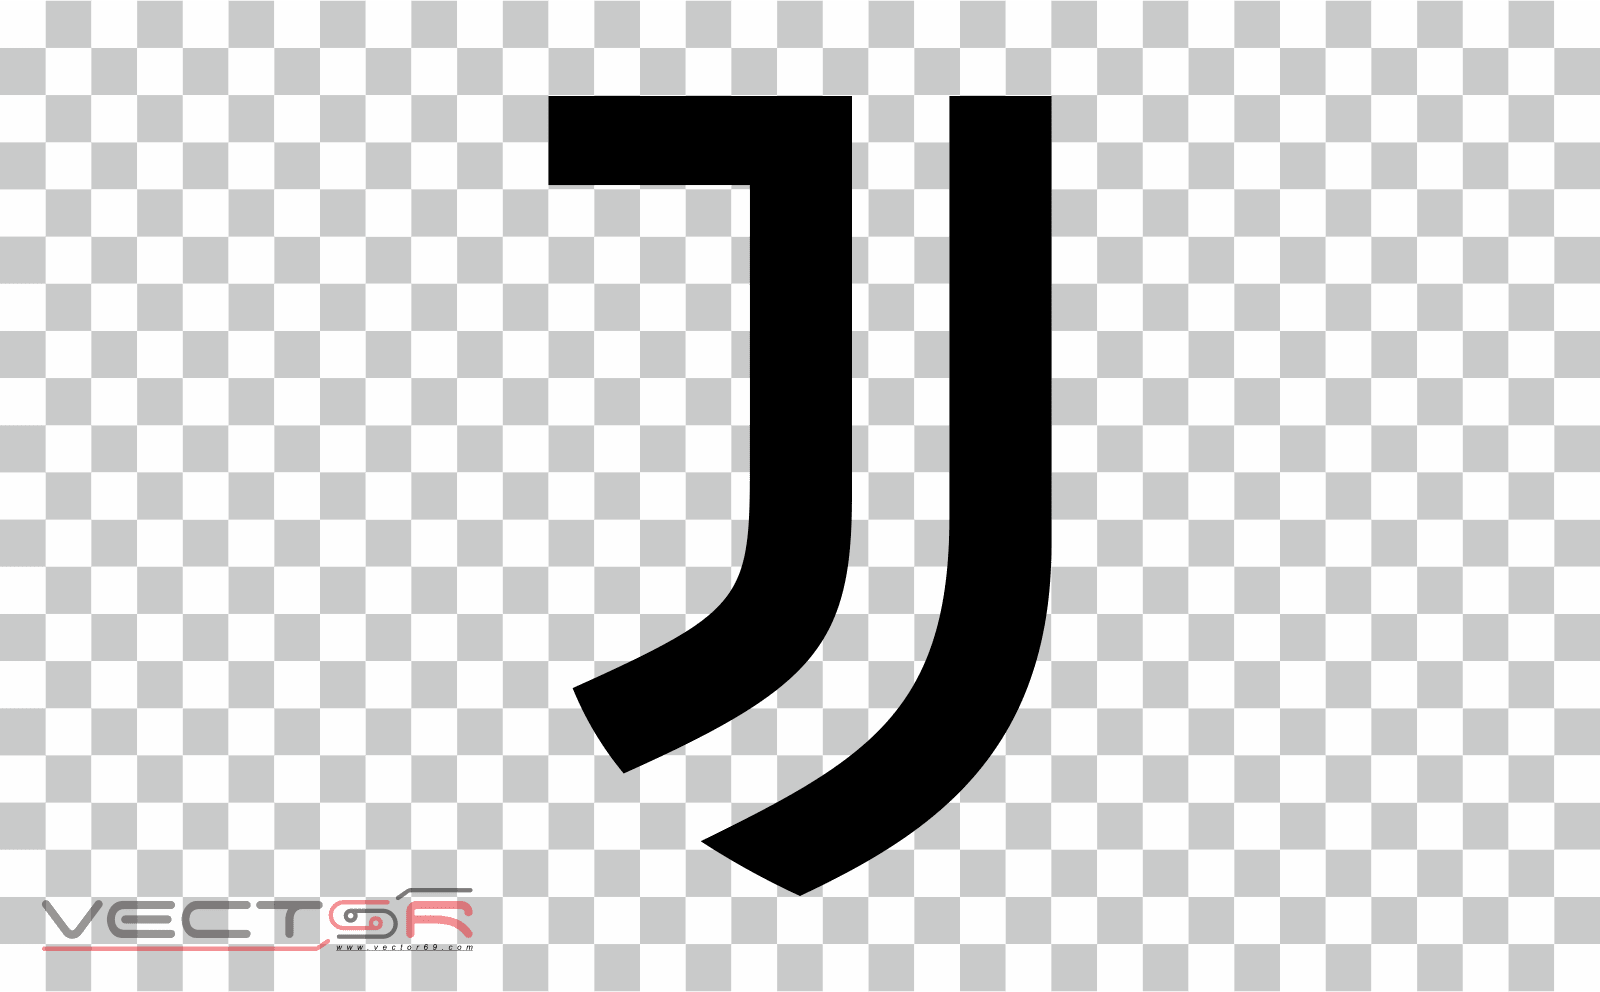 Juventus F.C. (2020) Logo - Download .PNG (Portable Network Graphics) Transparent Images